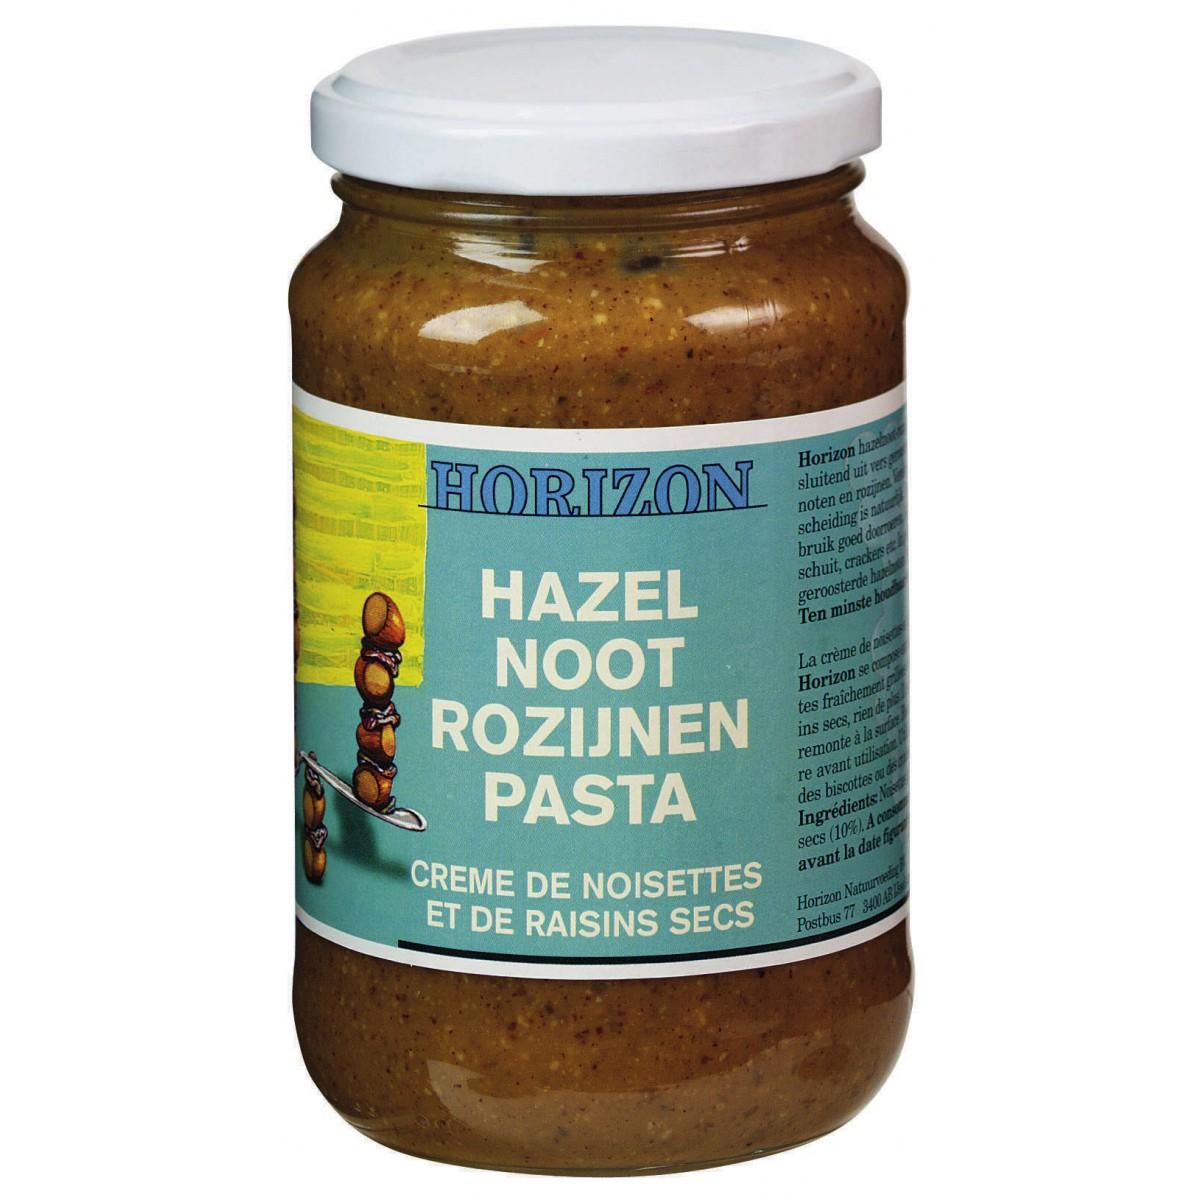 Hazelnoot-Rozijnenpasta